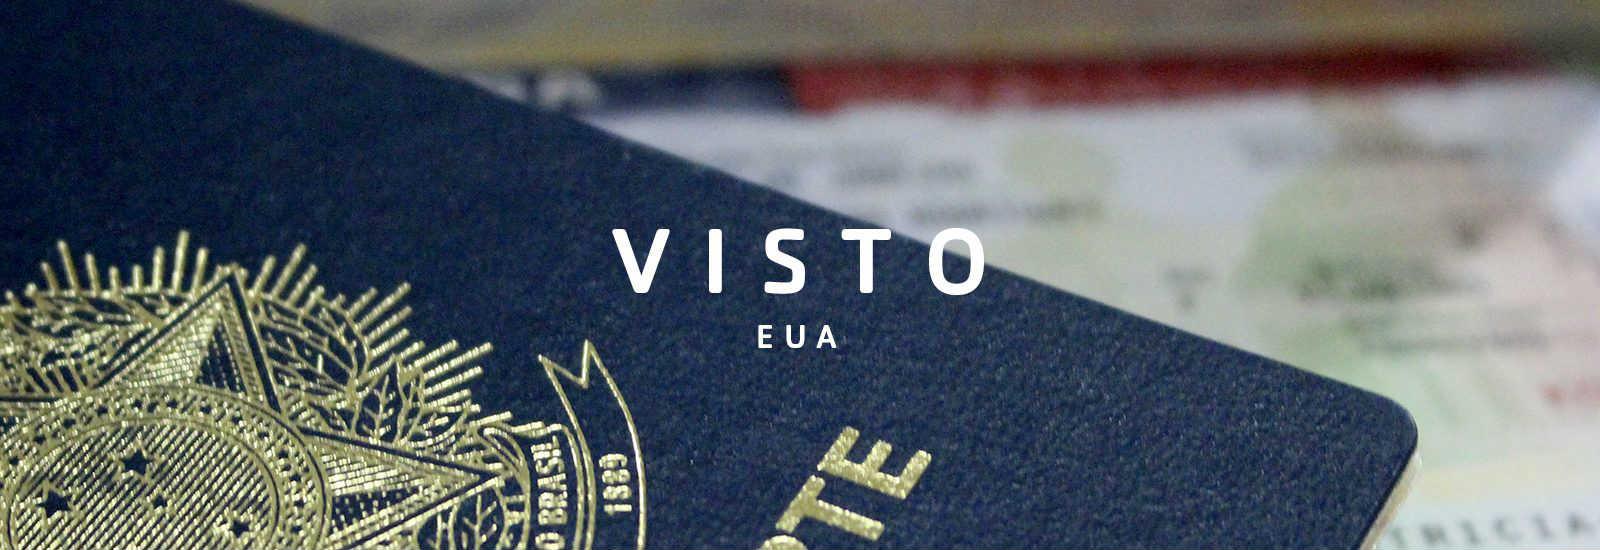 banner intercambio viagens internacional USA assessoria vistos embaixada exterior jovens Belo horizonte agencia ed - Camp Counselor (YCCP)